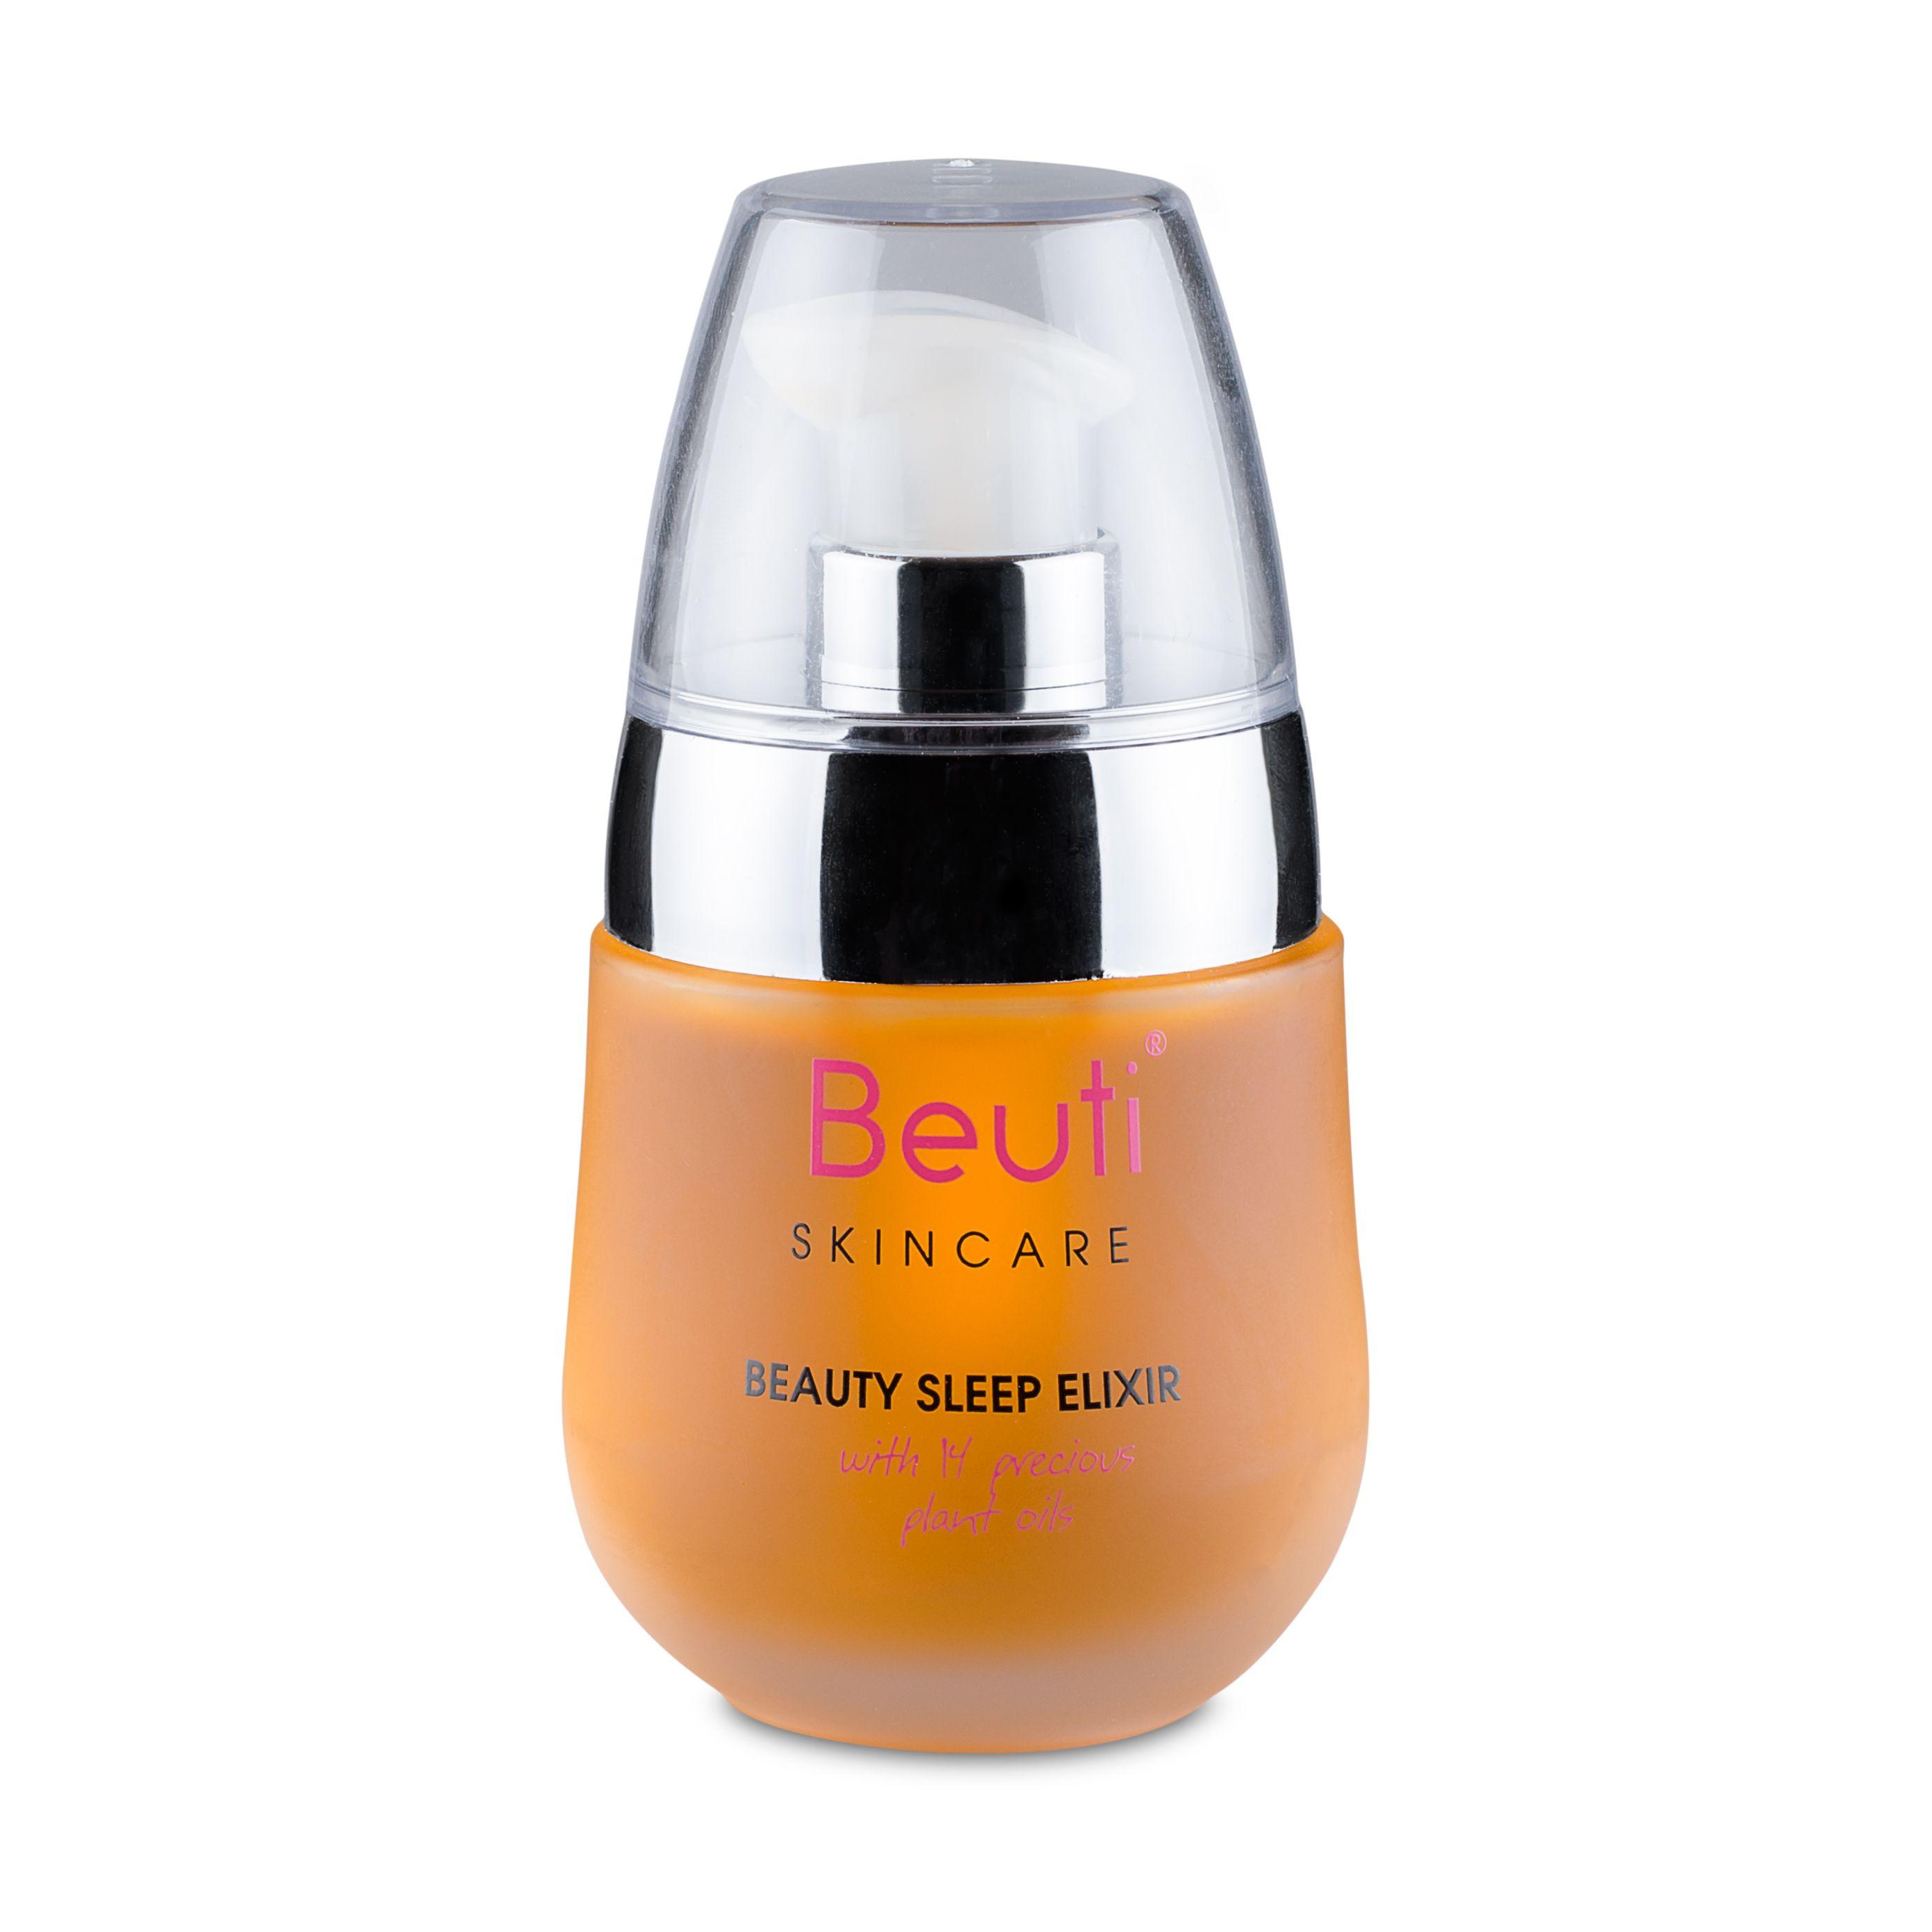 Beauty Sleep Elixir Skin Care Anti Aging Skin Products Beauty Skin Care